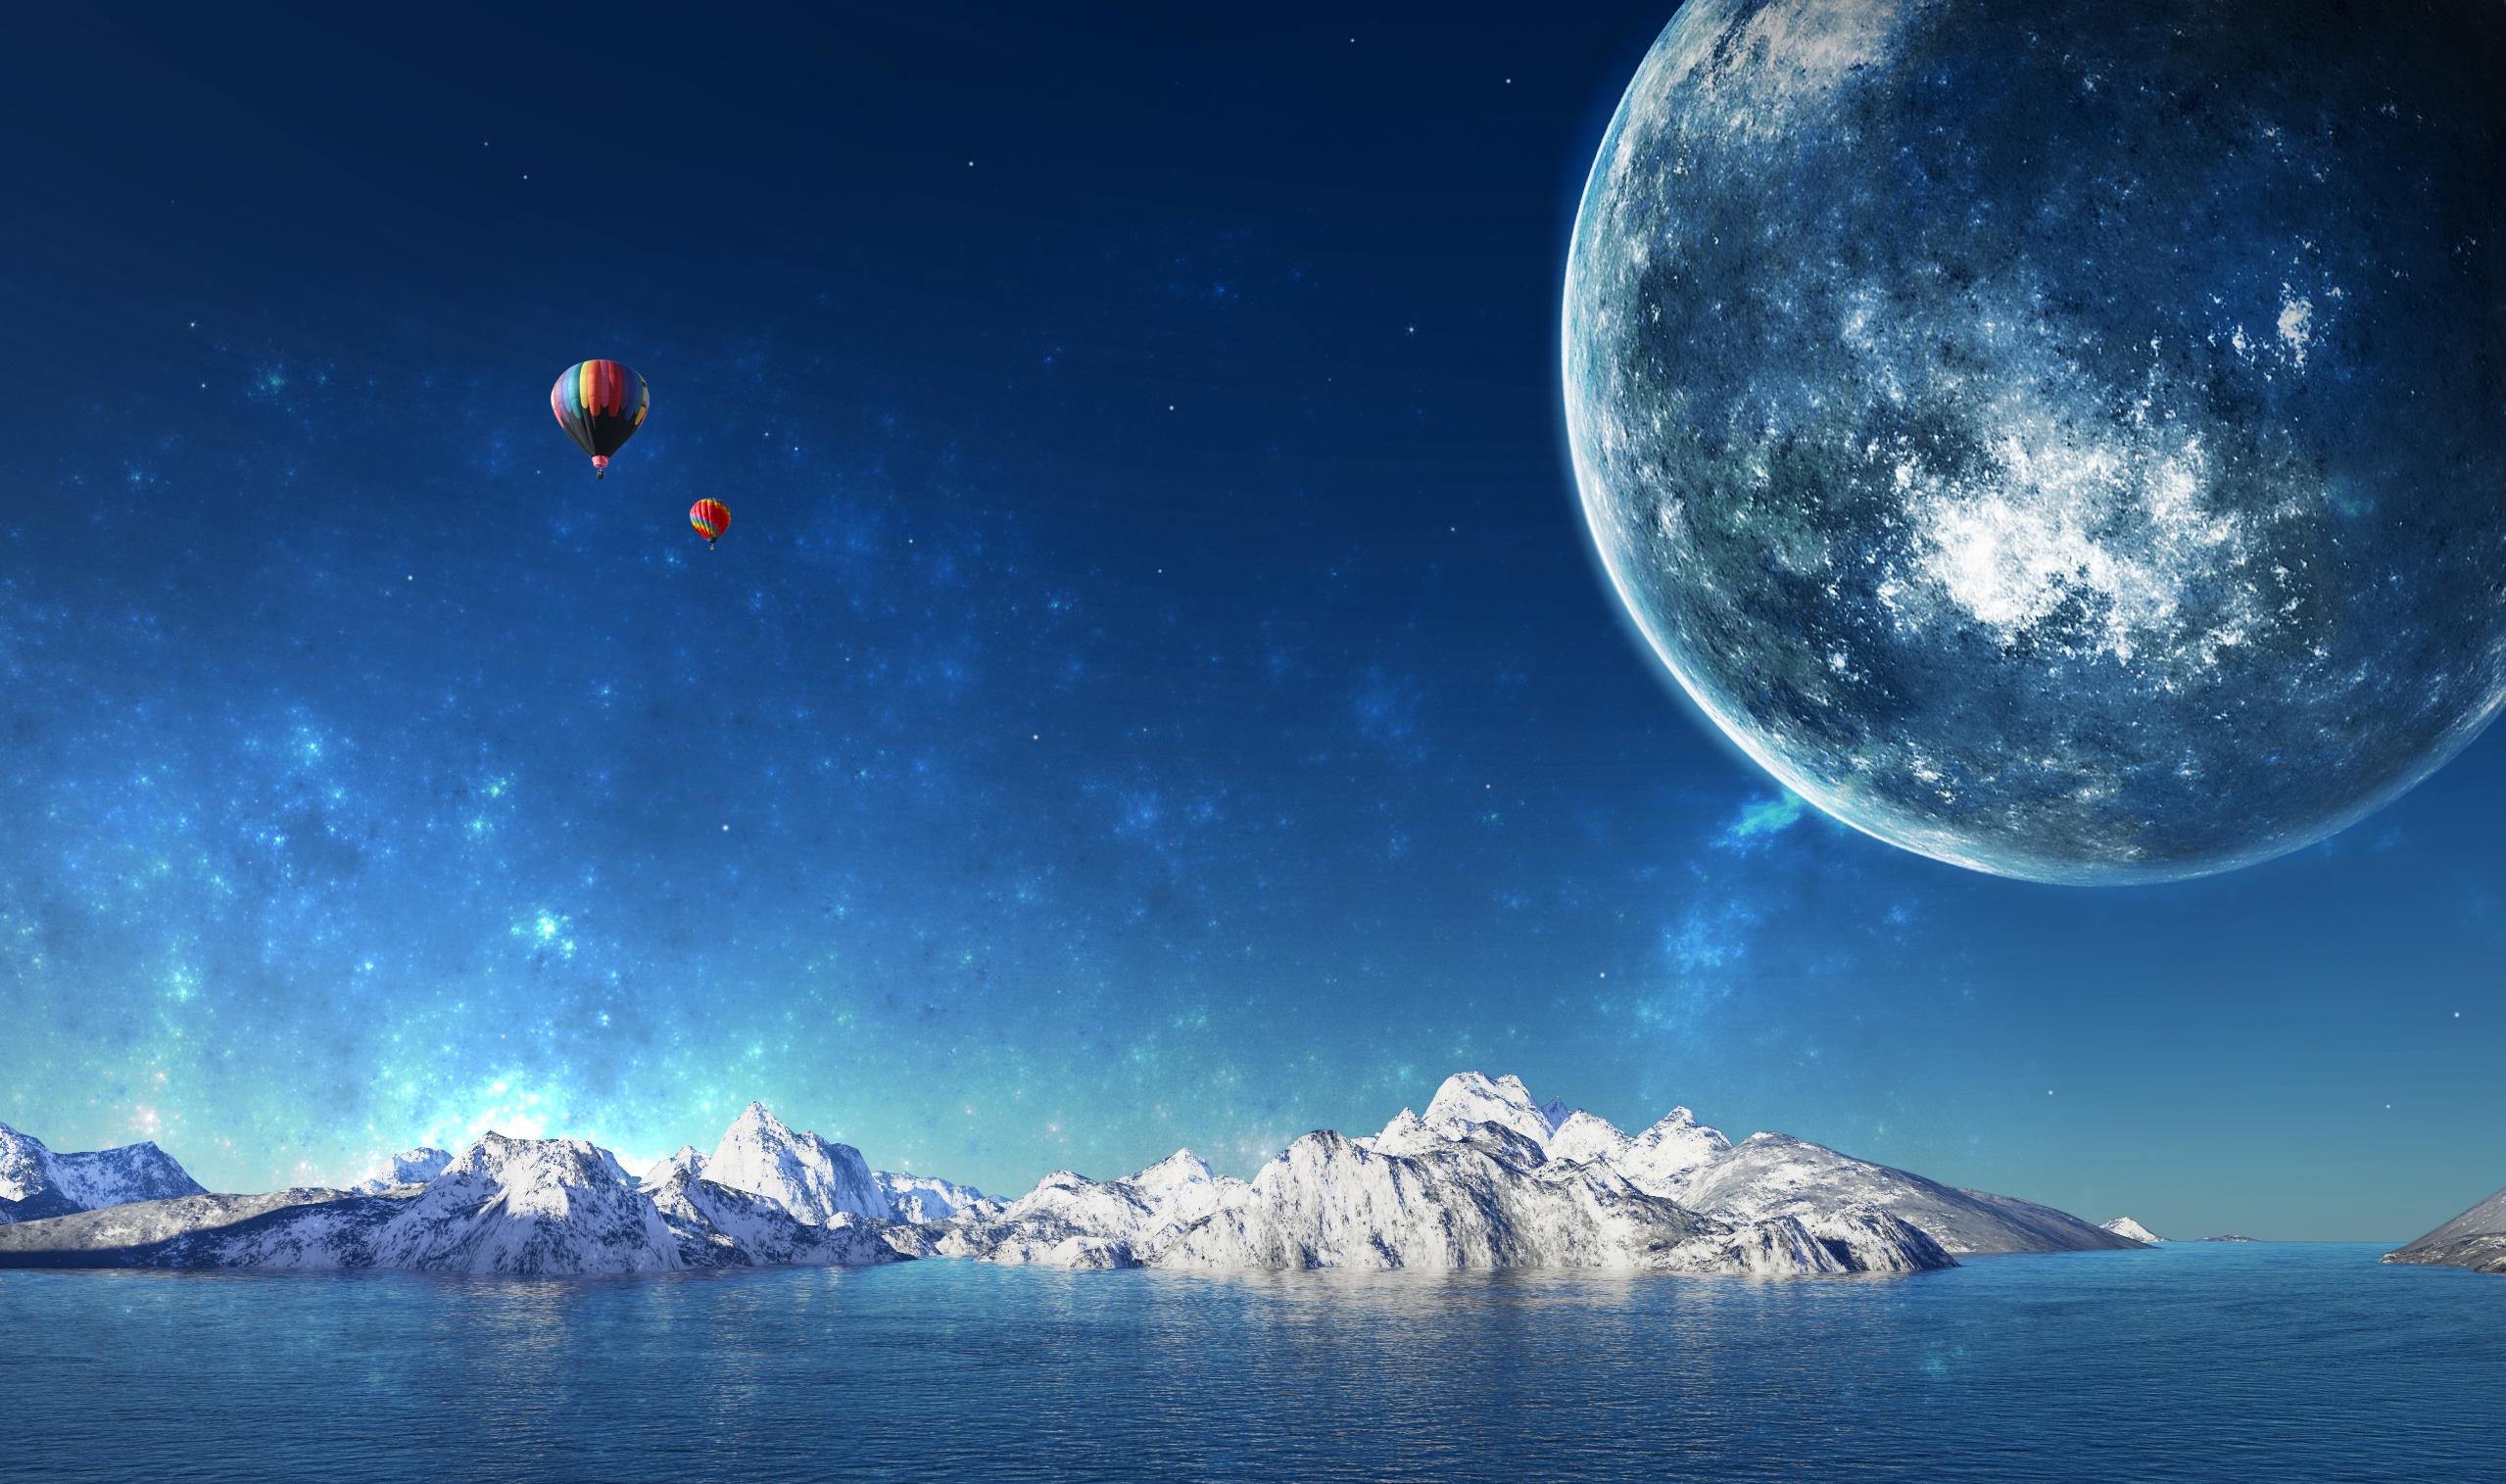 Dreamy World Wallpaper